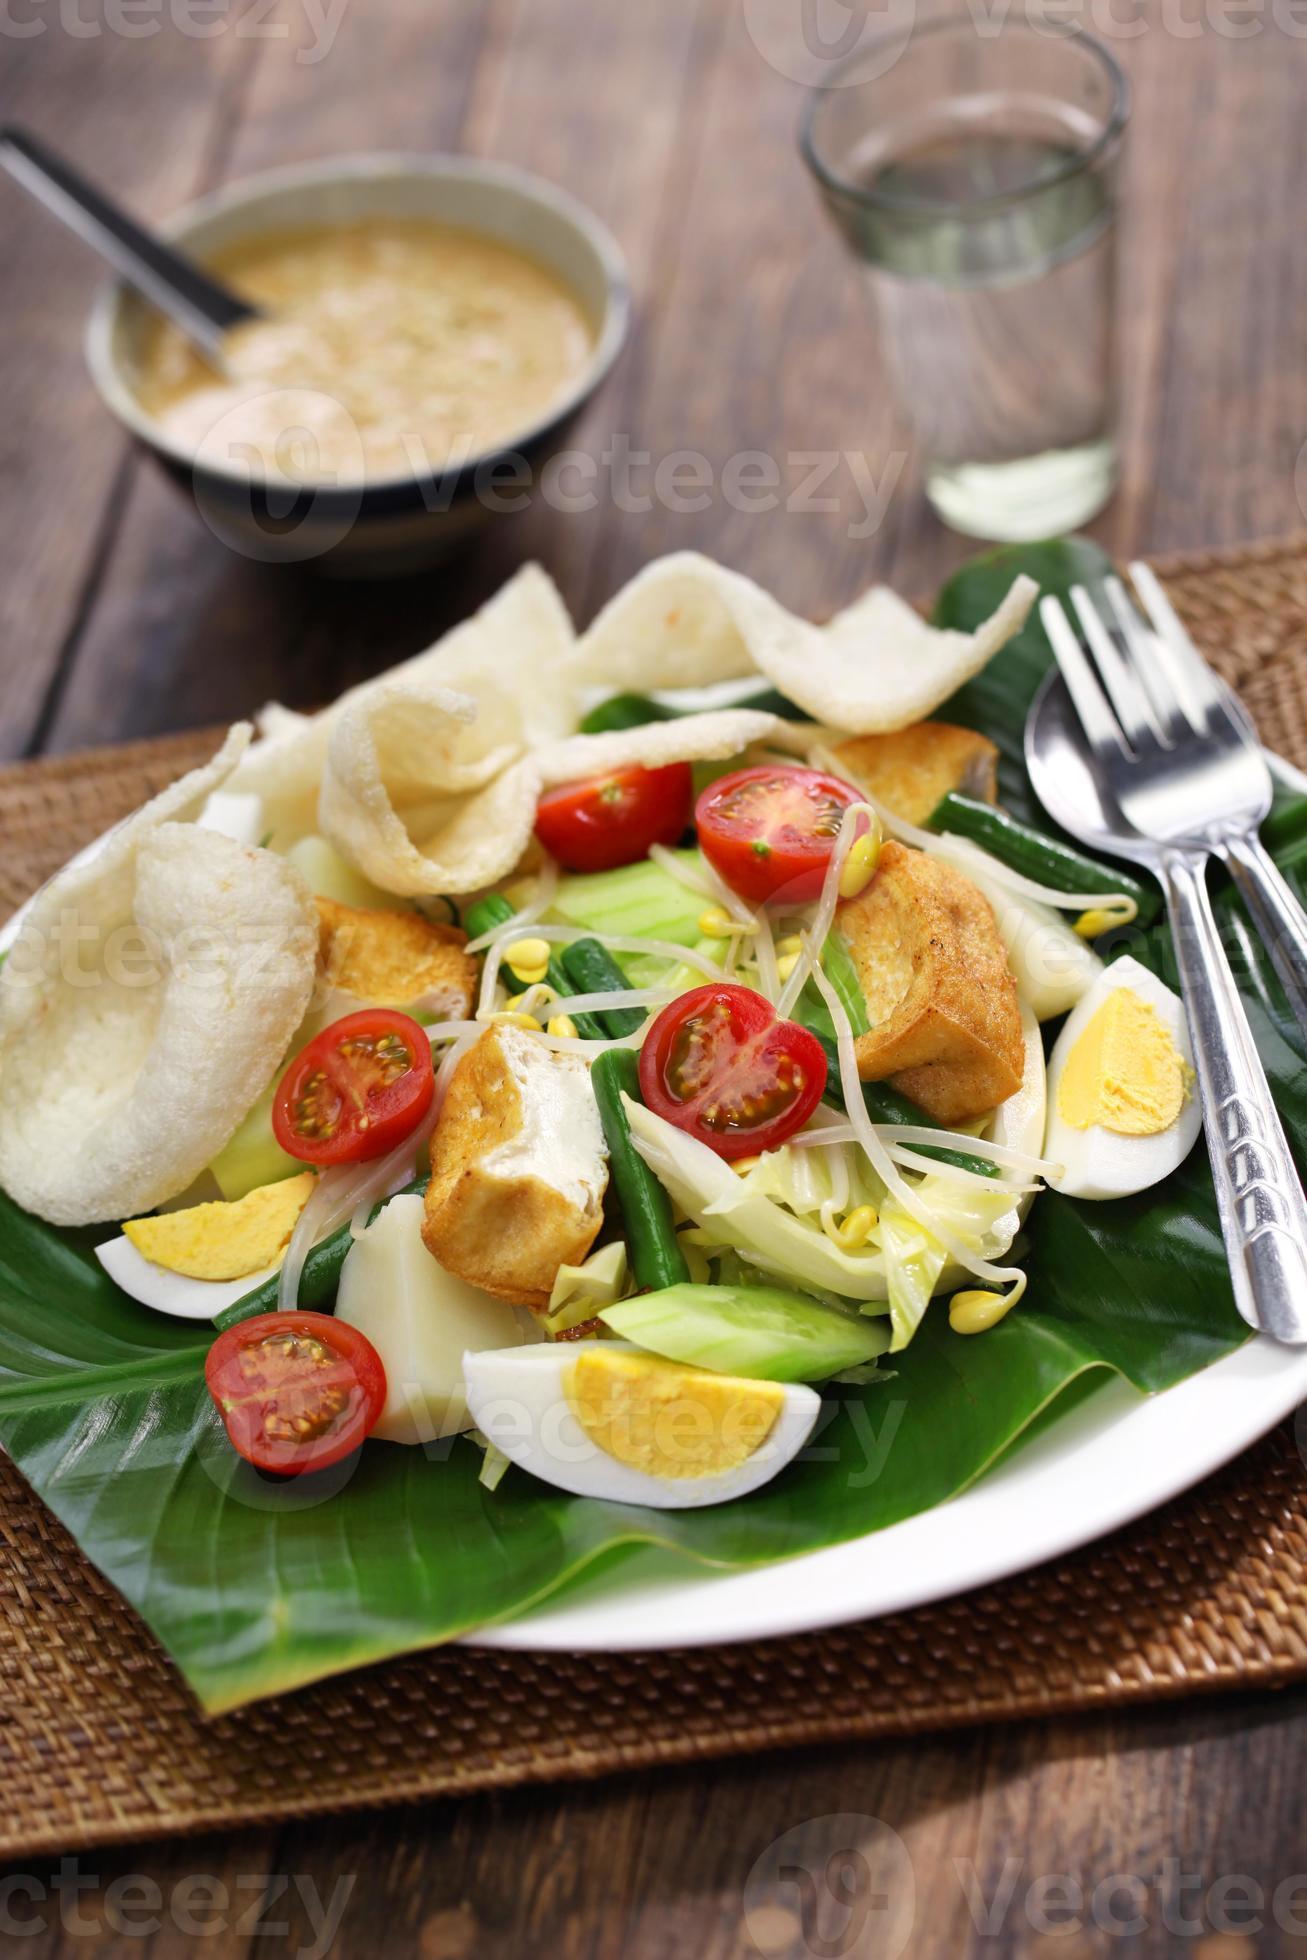 Gado Gado Indonesian Salad With Peanut Sauce 708337 Stock Photo At Vecteezy